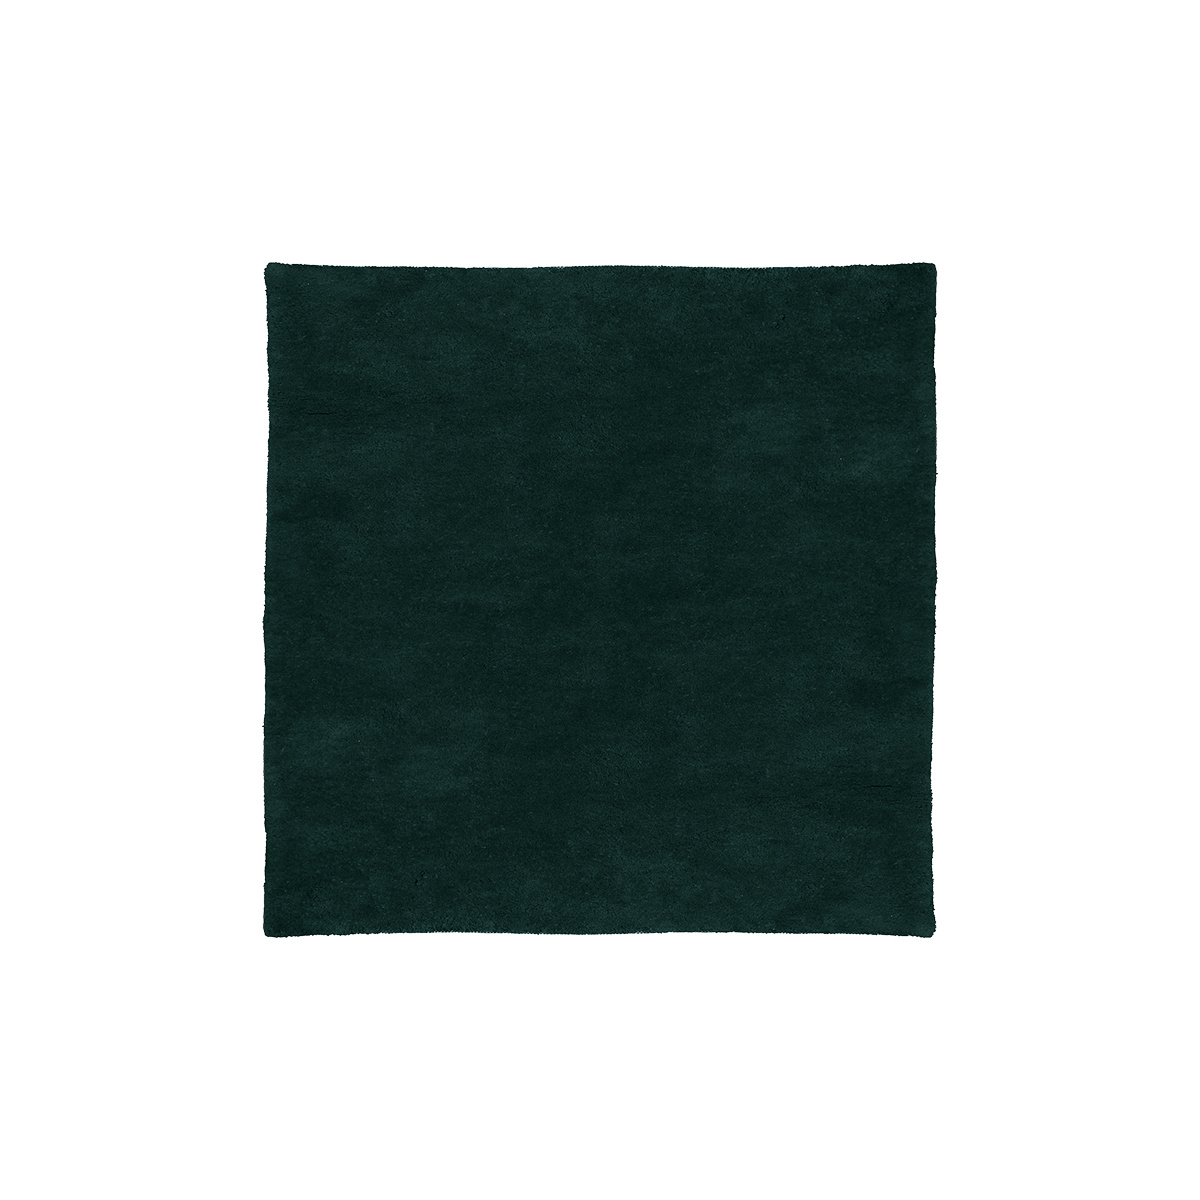 Tapis Velluto vert 200 x 200